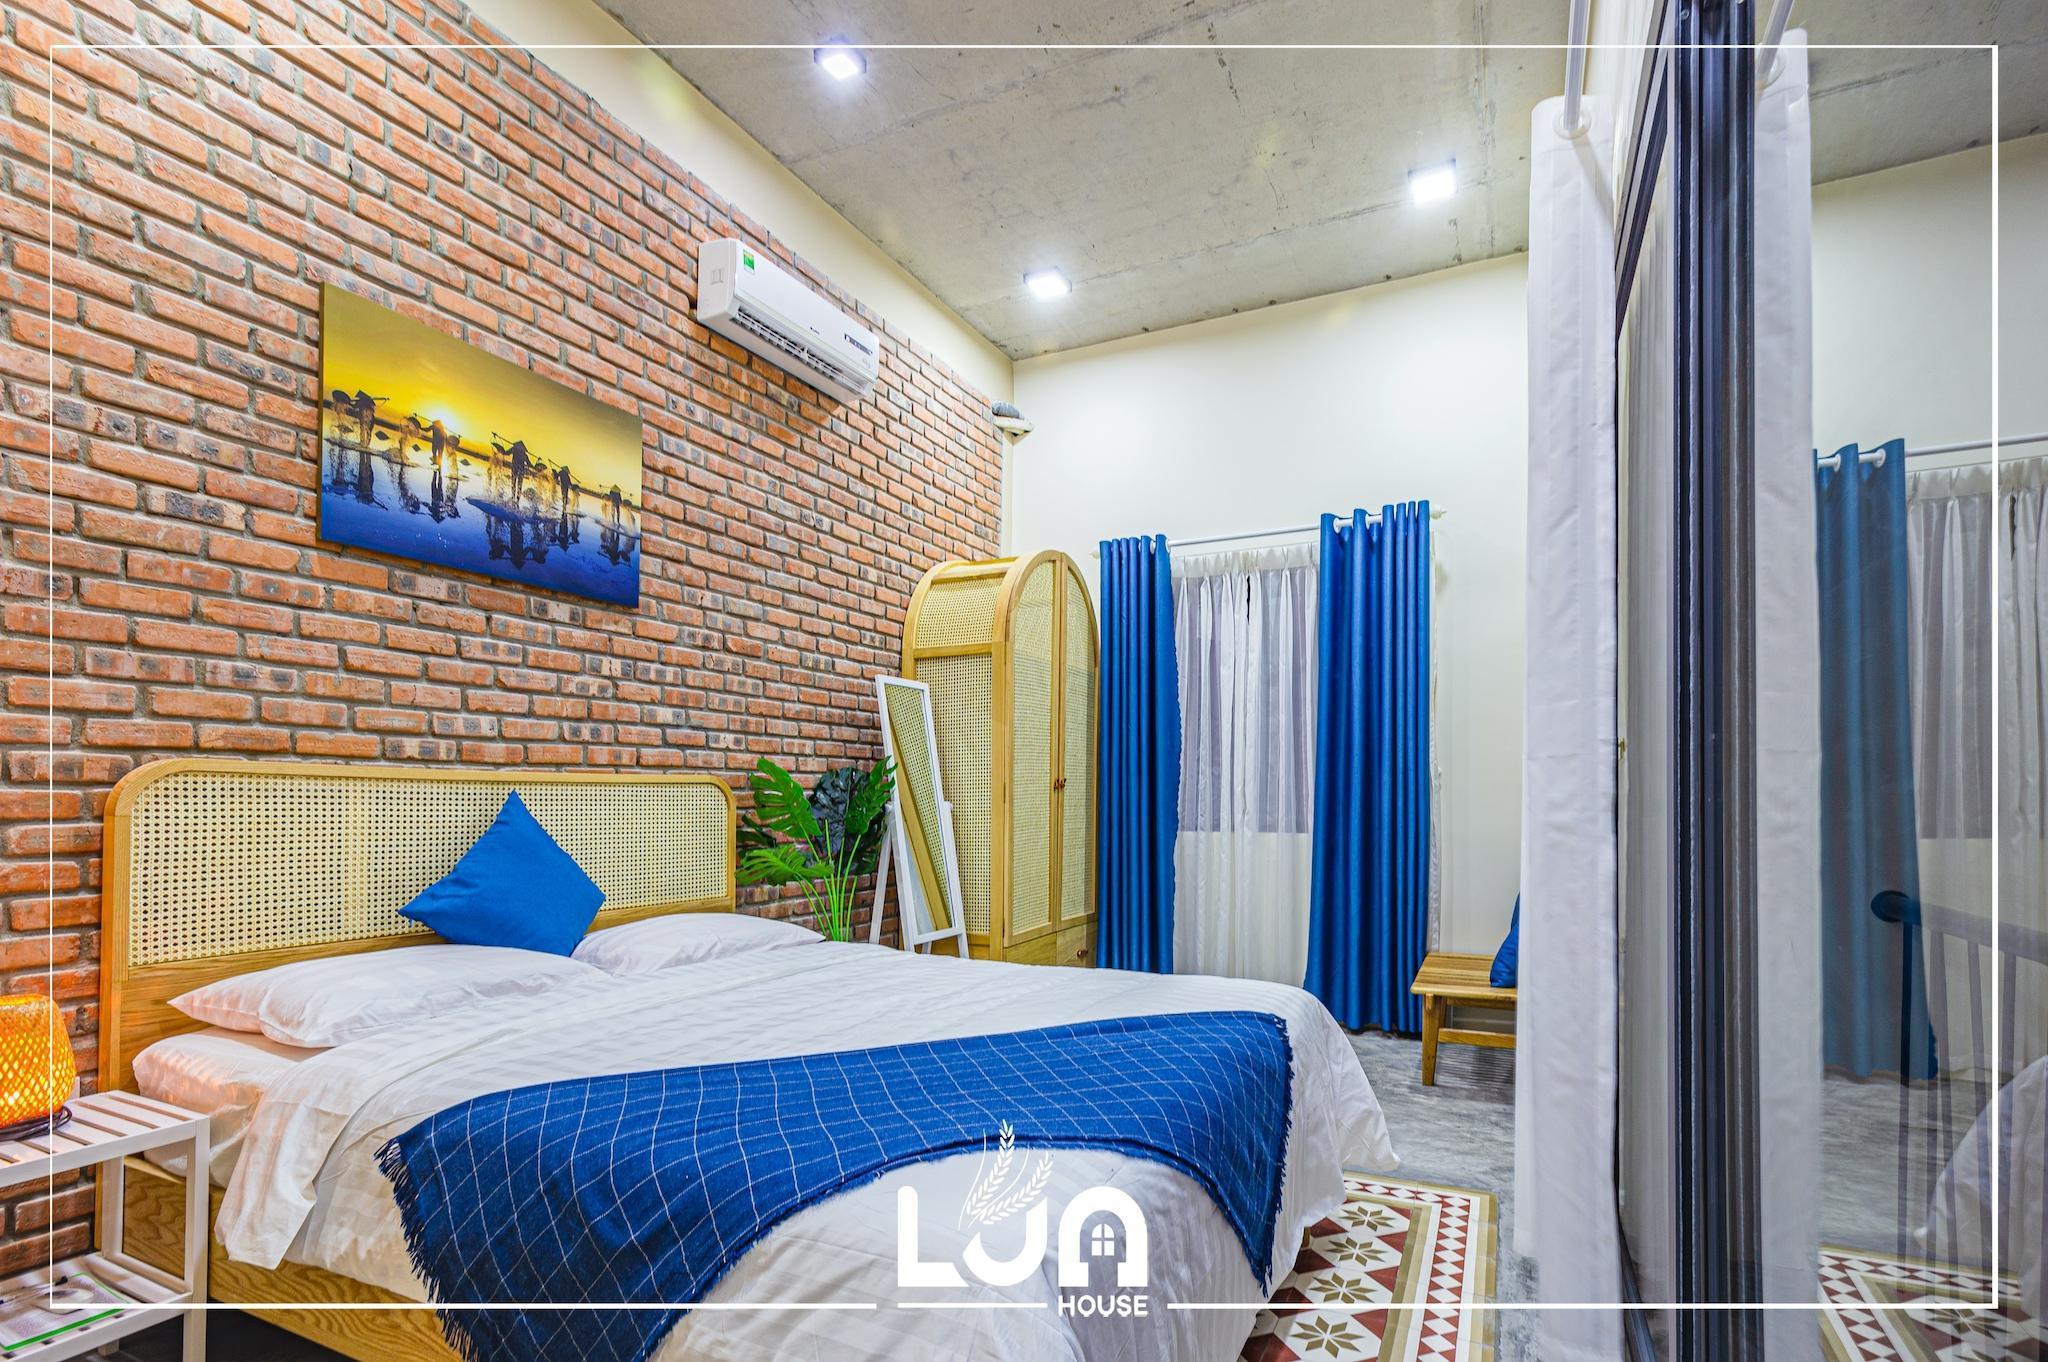 Lua House Apartment